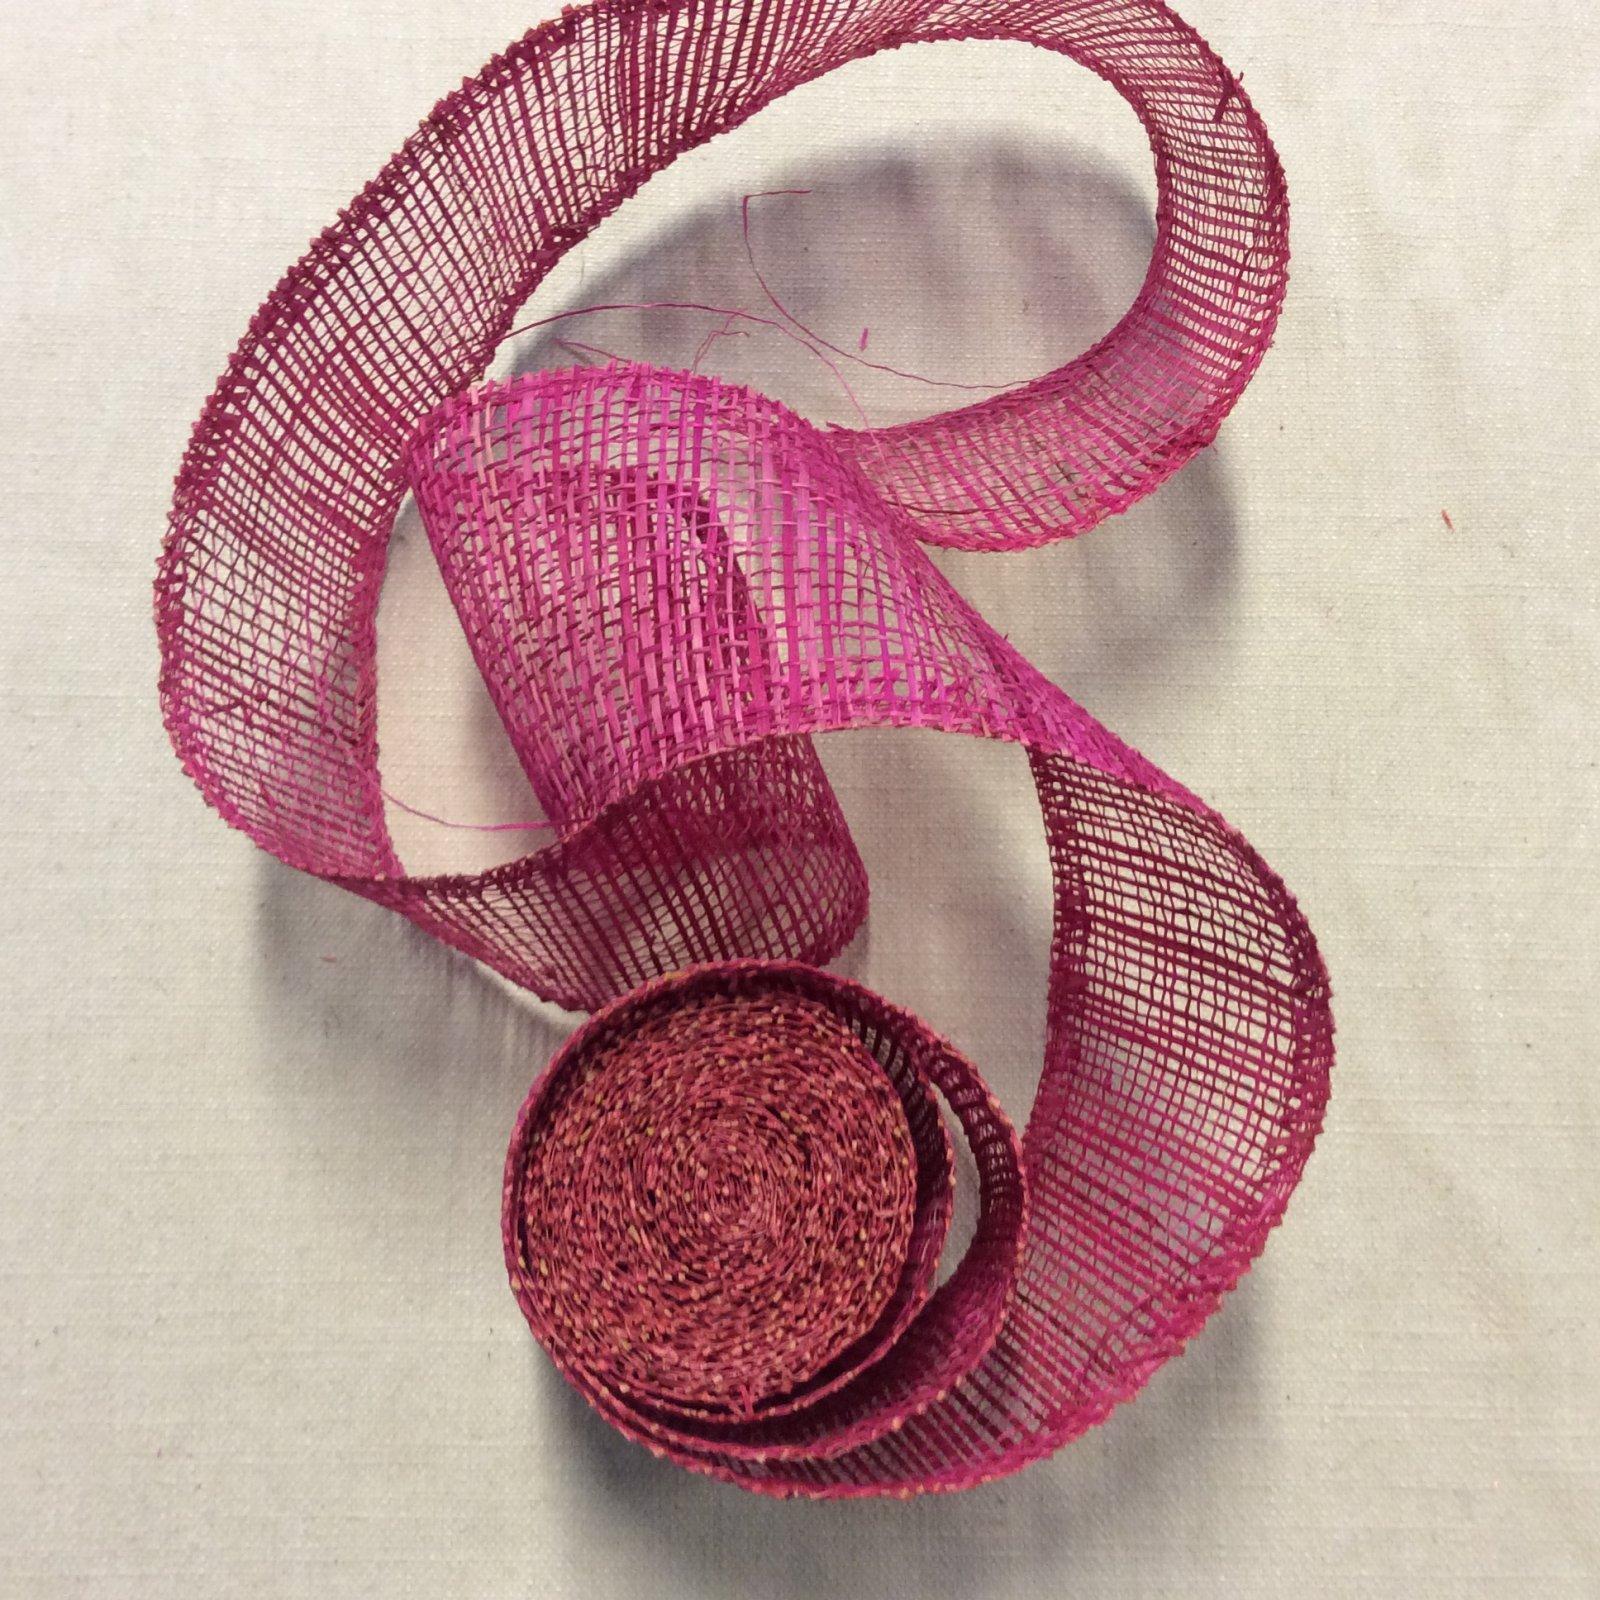 3 Yard Piece! Natural Woven Paper Like Ribbon 4 Pink Trim RIB1293